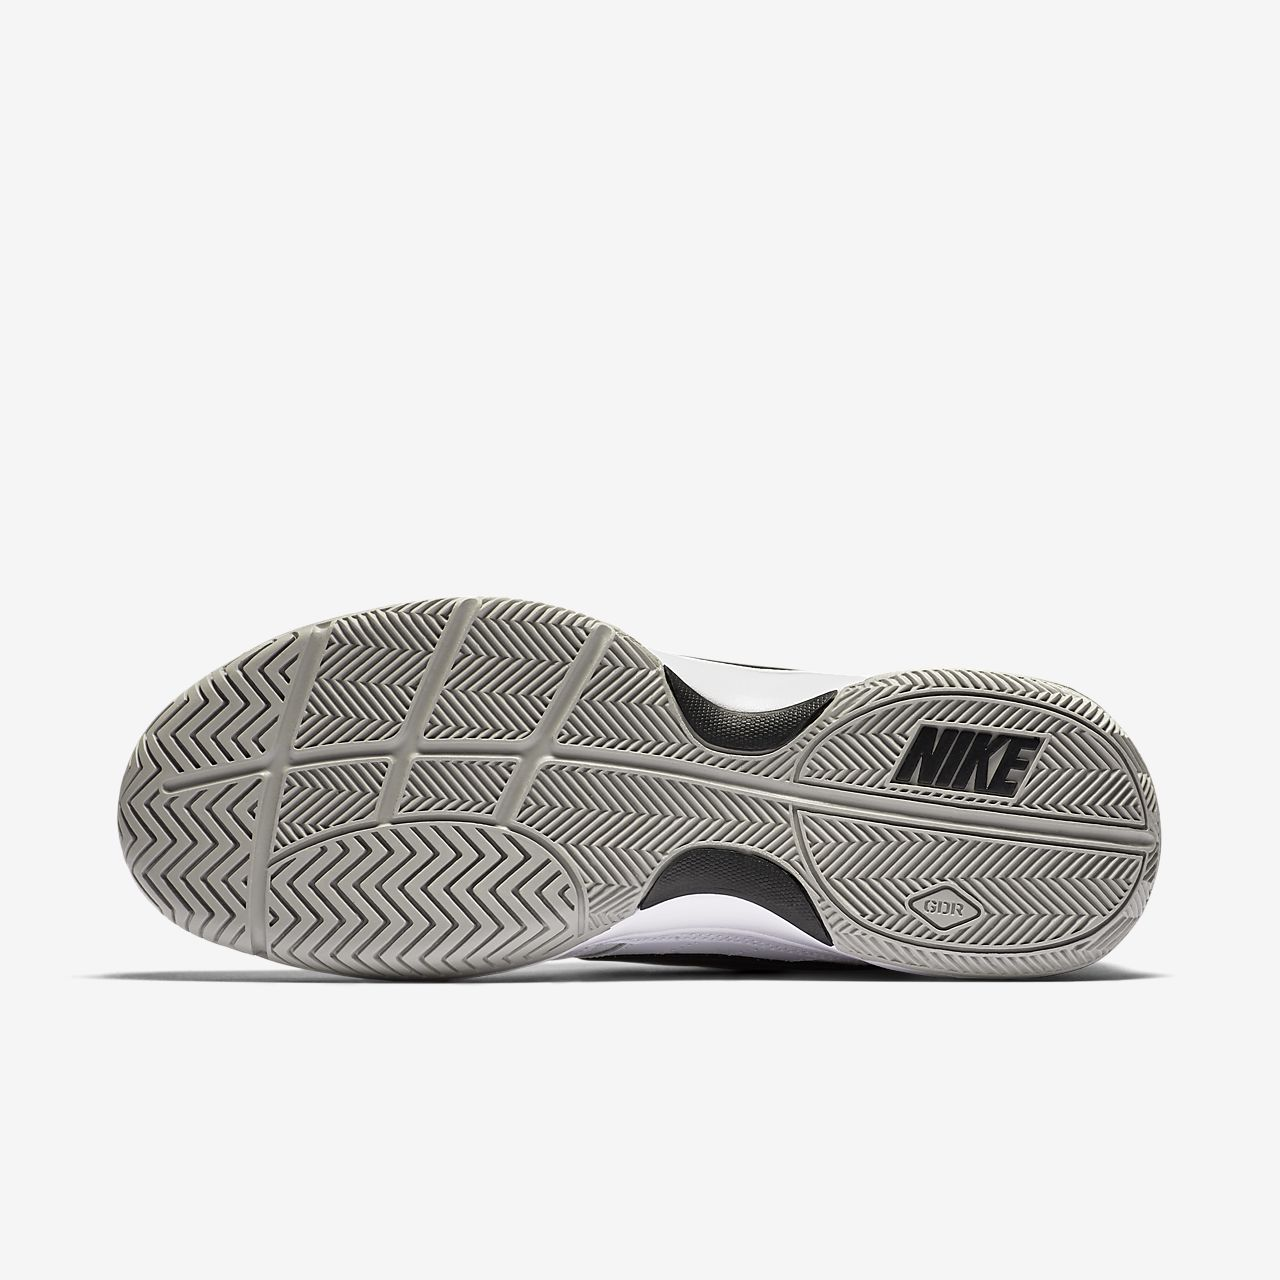 3a204cb2064 NikeCourt Lite Men s Hard Court Tennis Shoe. Nike.com